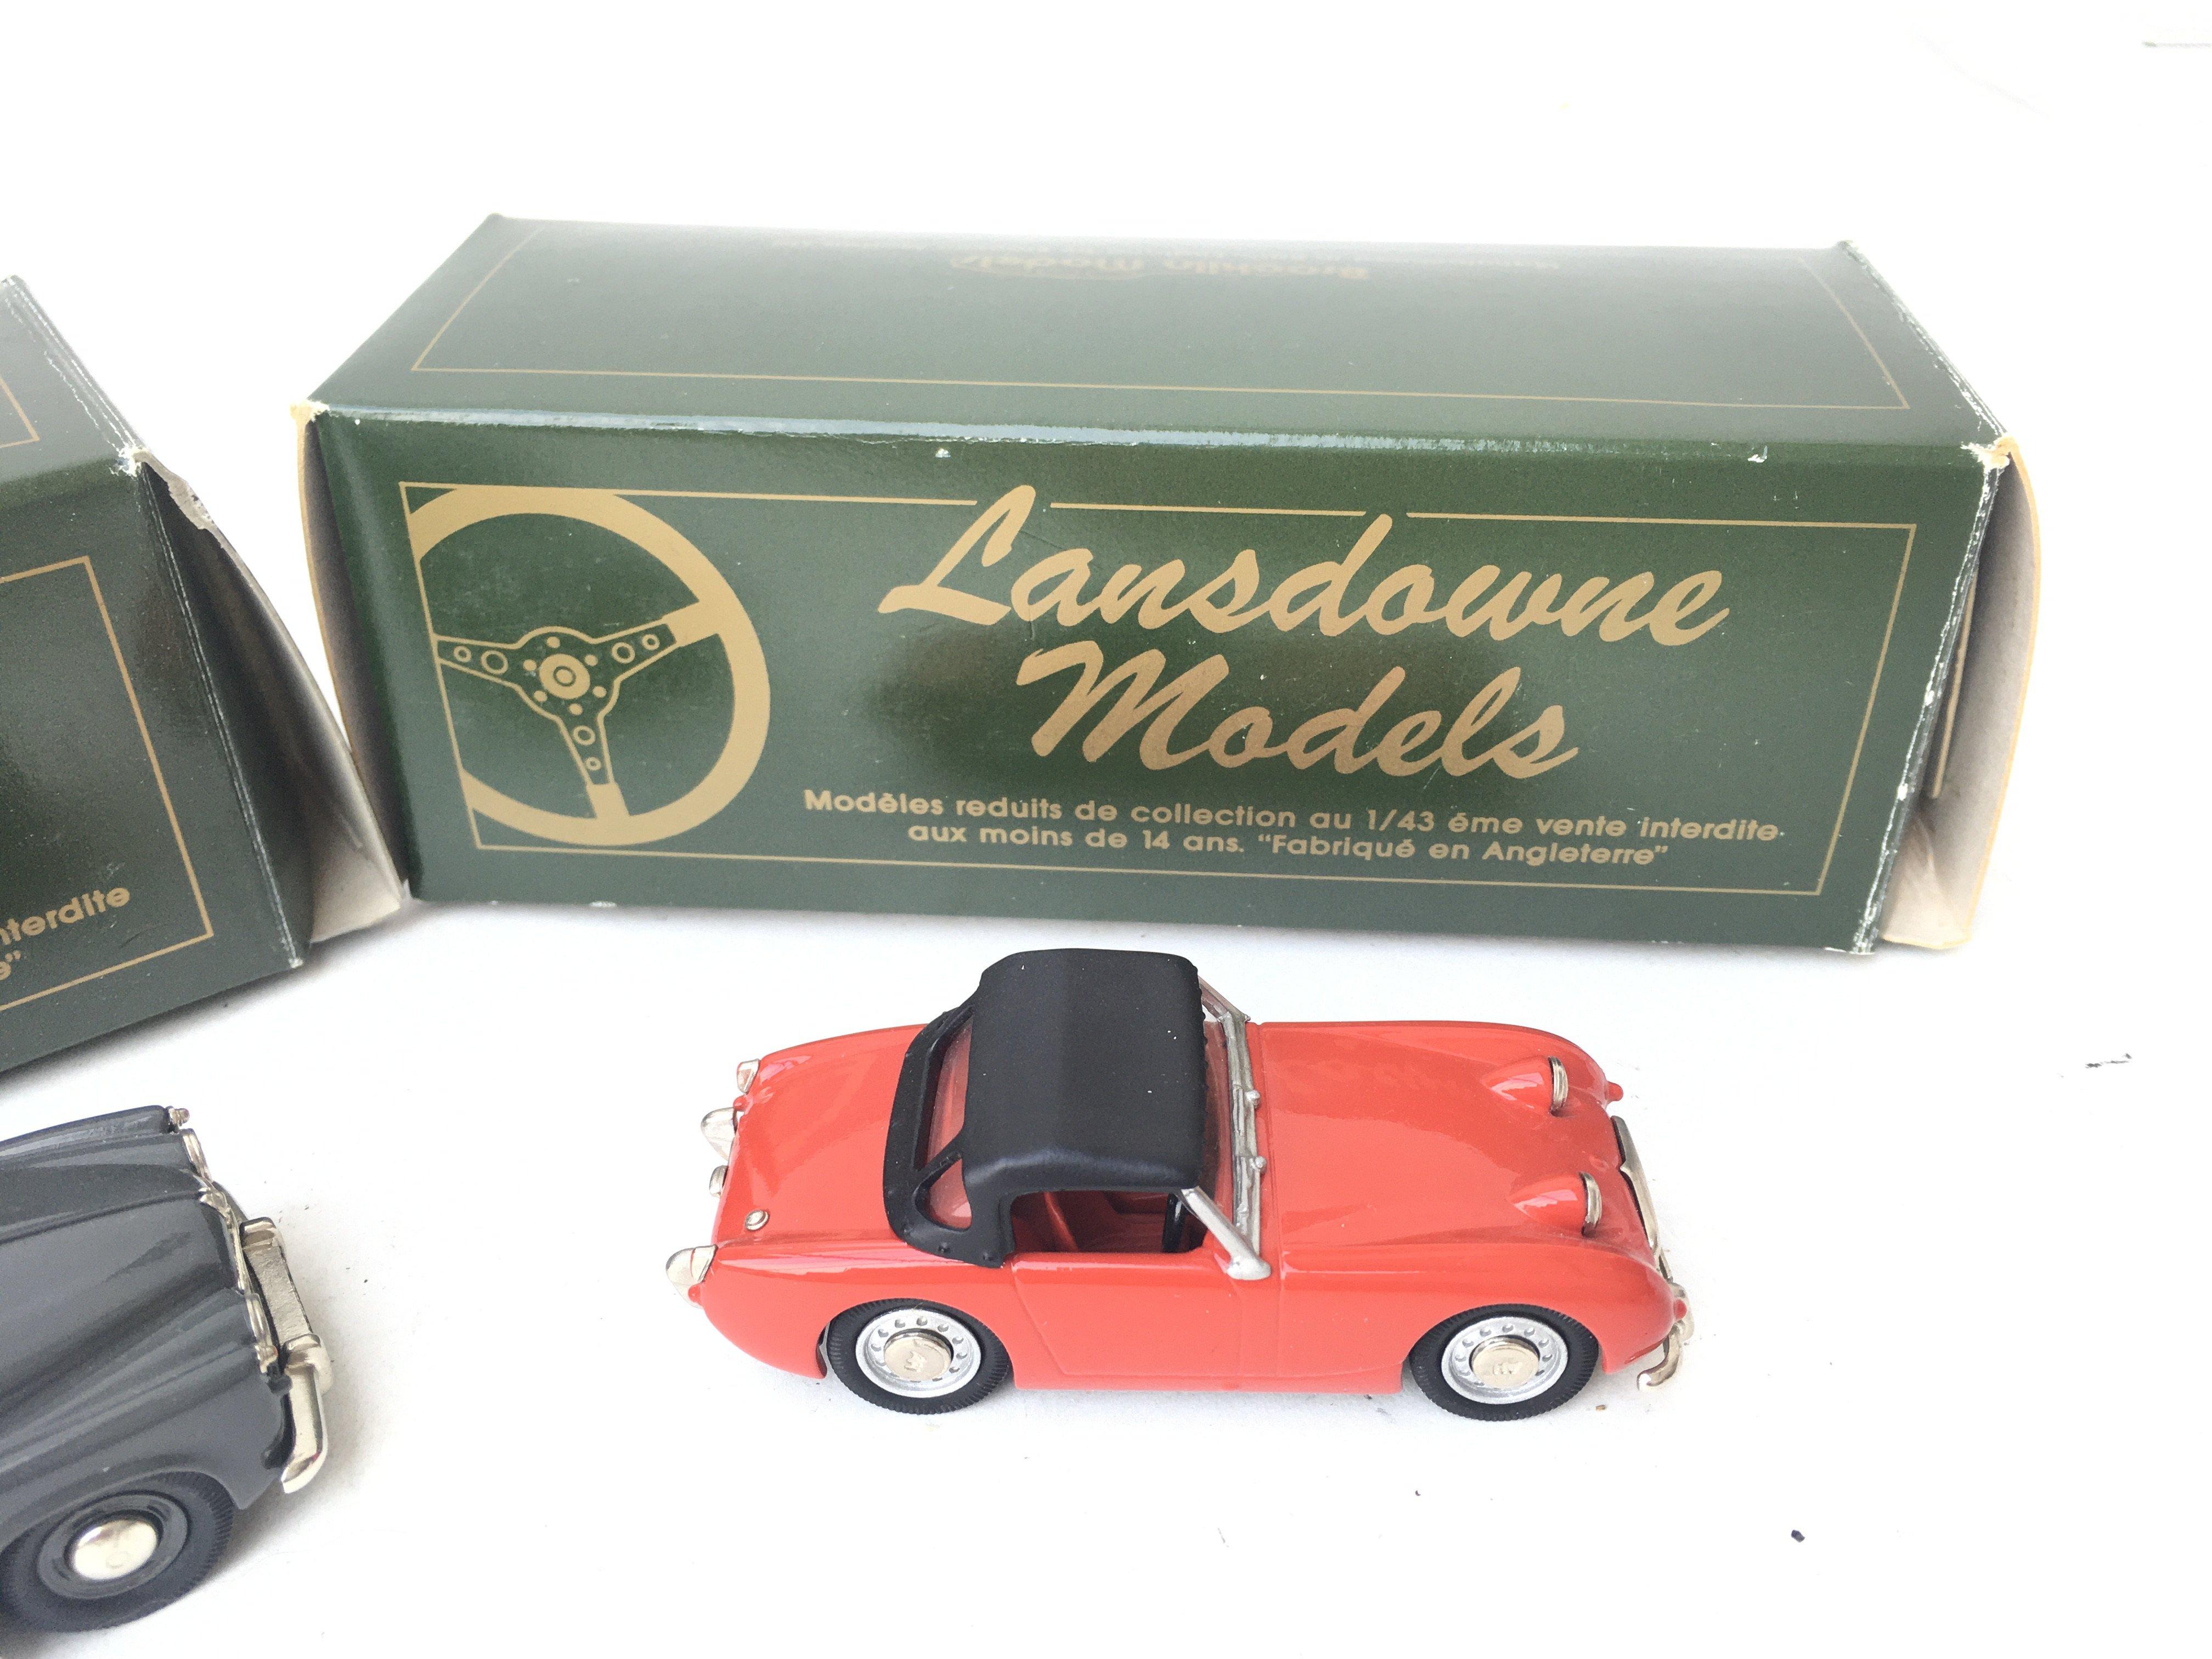 2 X Lansdowne Models including LDM.5 1957 Rover P4 - Image 3 of 3